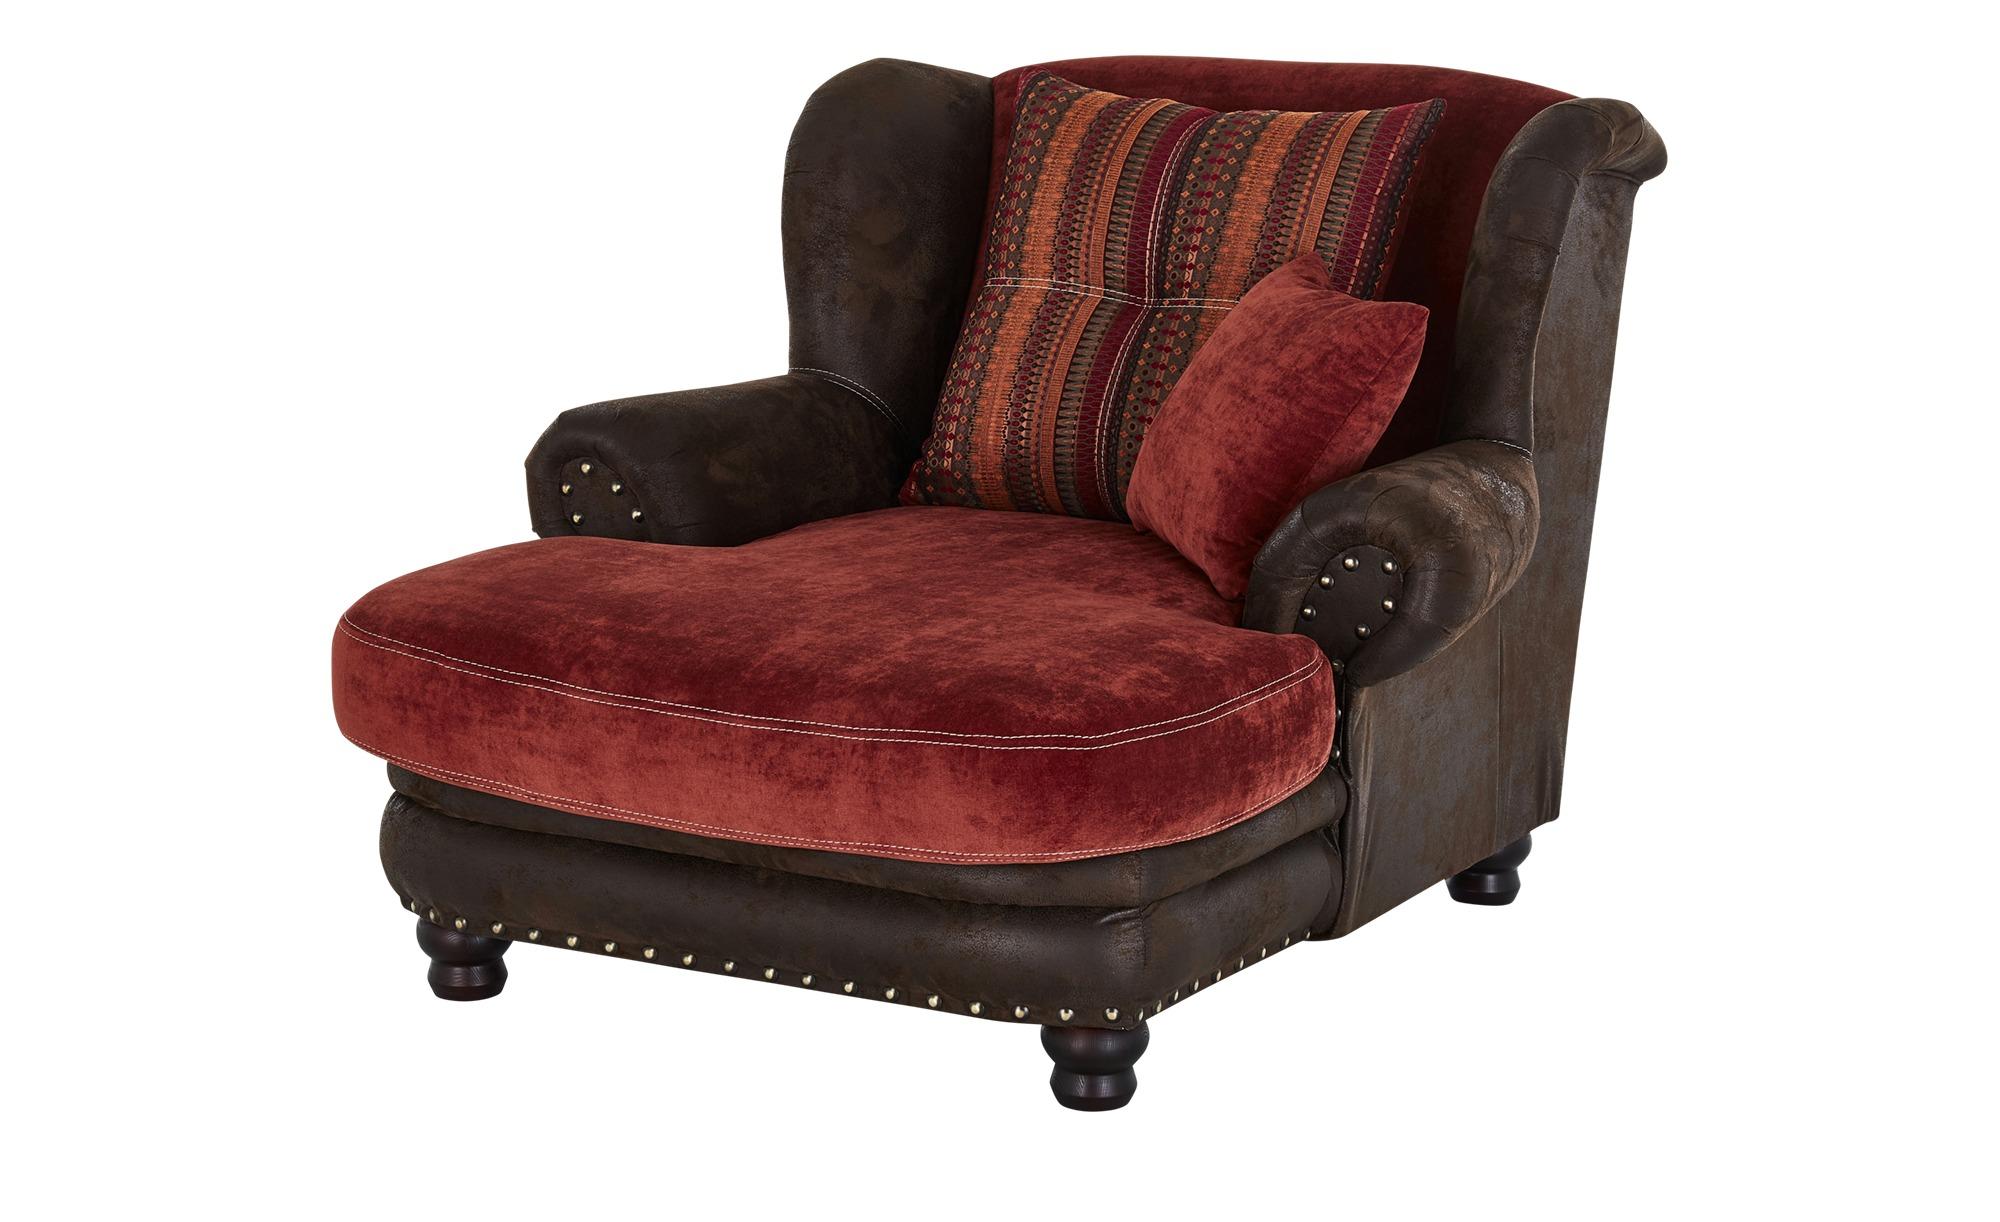 Mega Ohrensessel  Bristol ¦ rot ¦ Maße (cm): B: 125 H: 100 T: 140 Polstermöbel > Sessel > Ohrensessel - Höffner